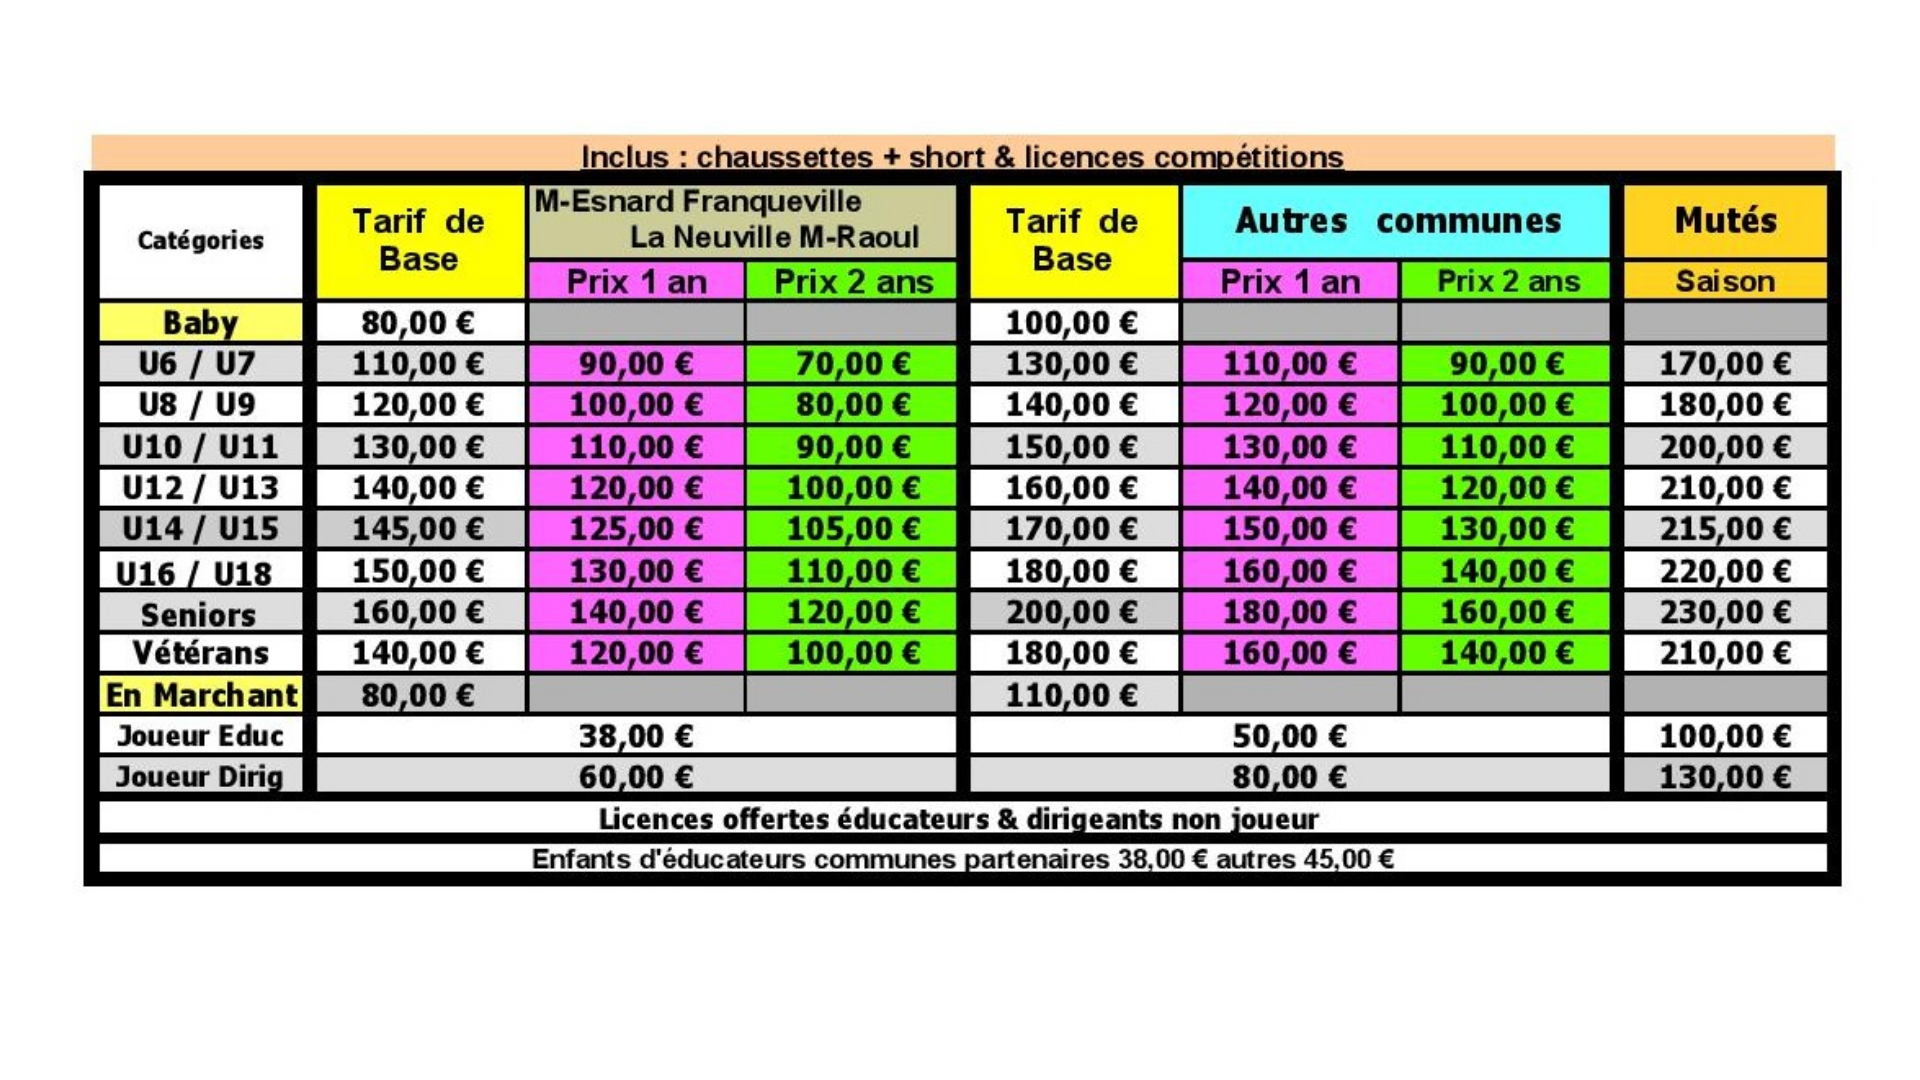 Tarifs des licences USMEF - Saison 2021/2022